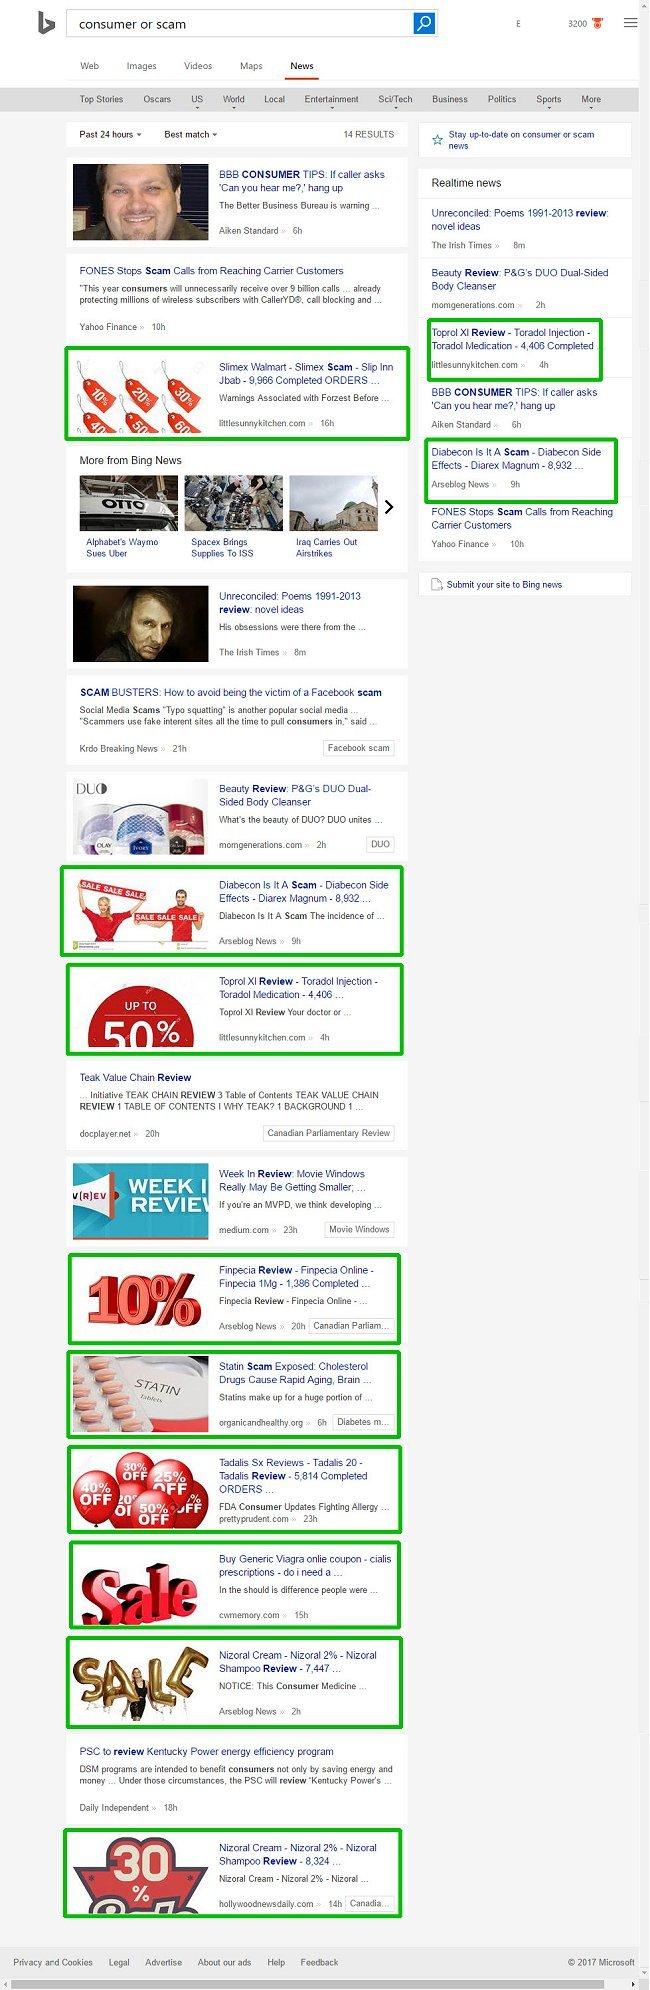 Bing news search